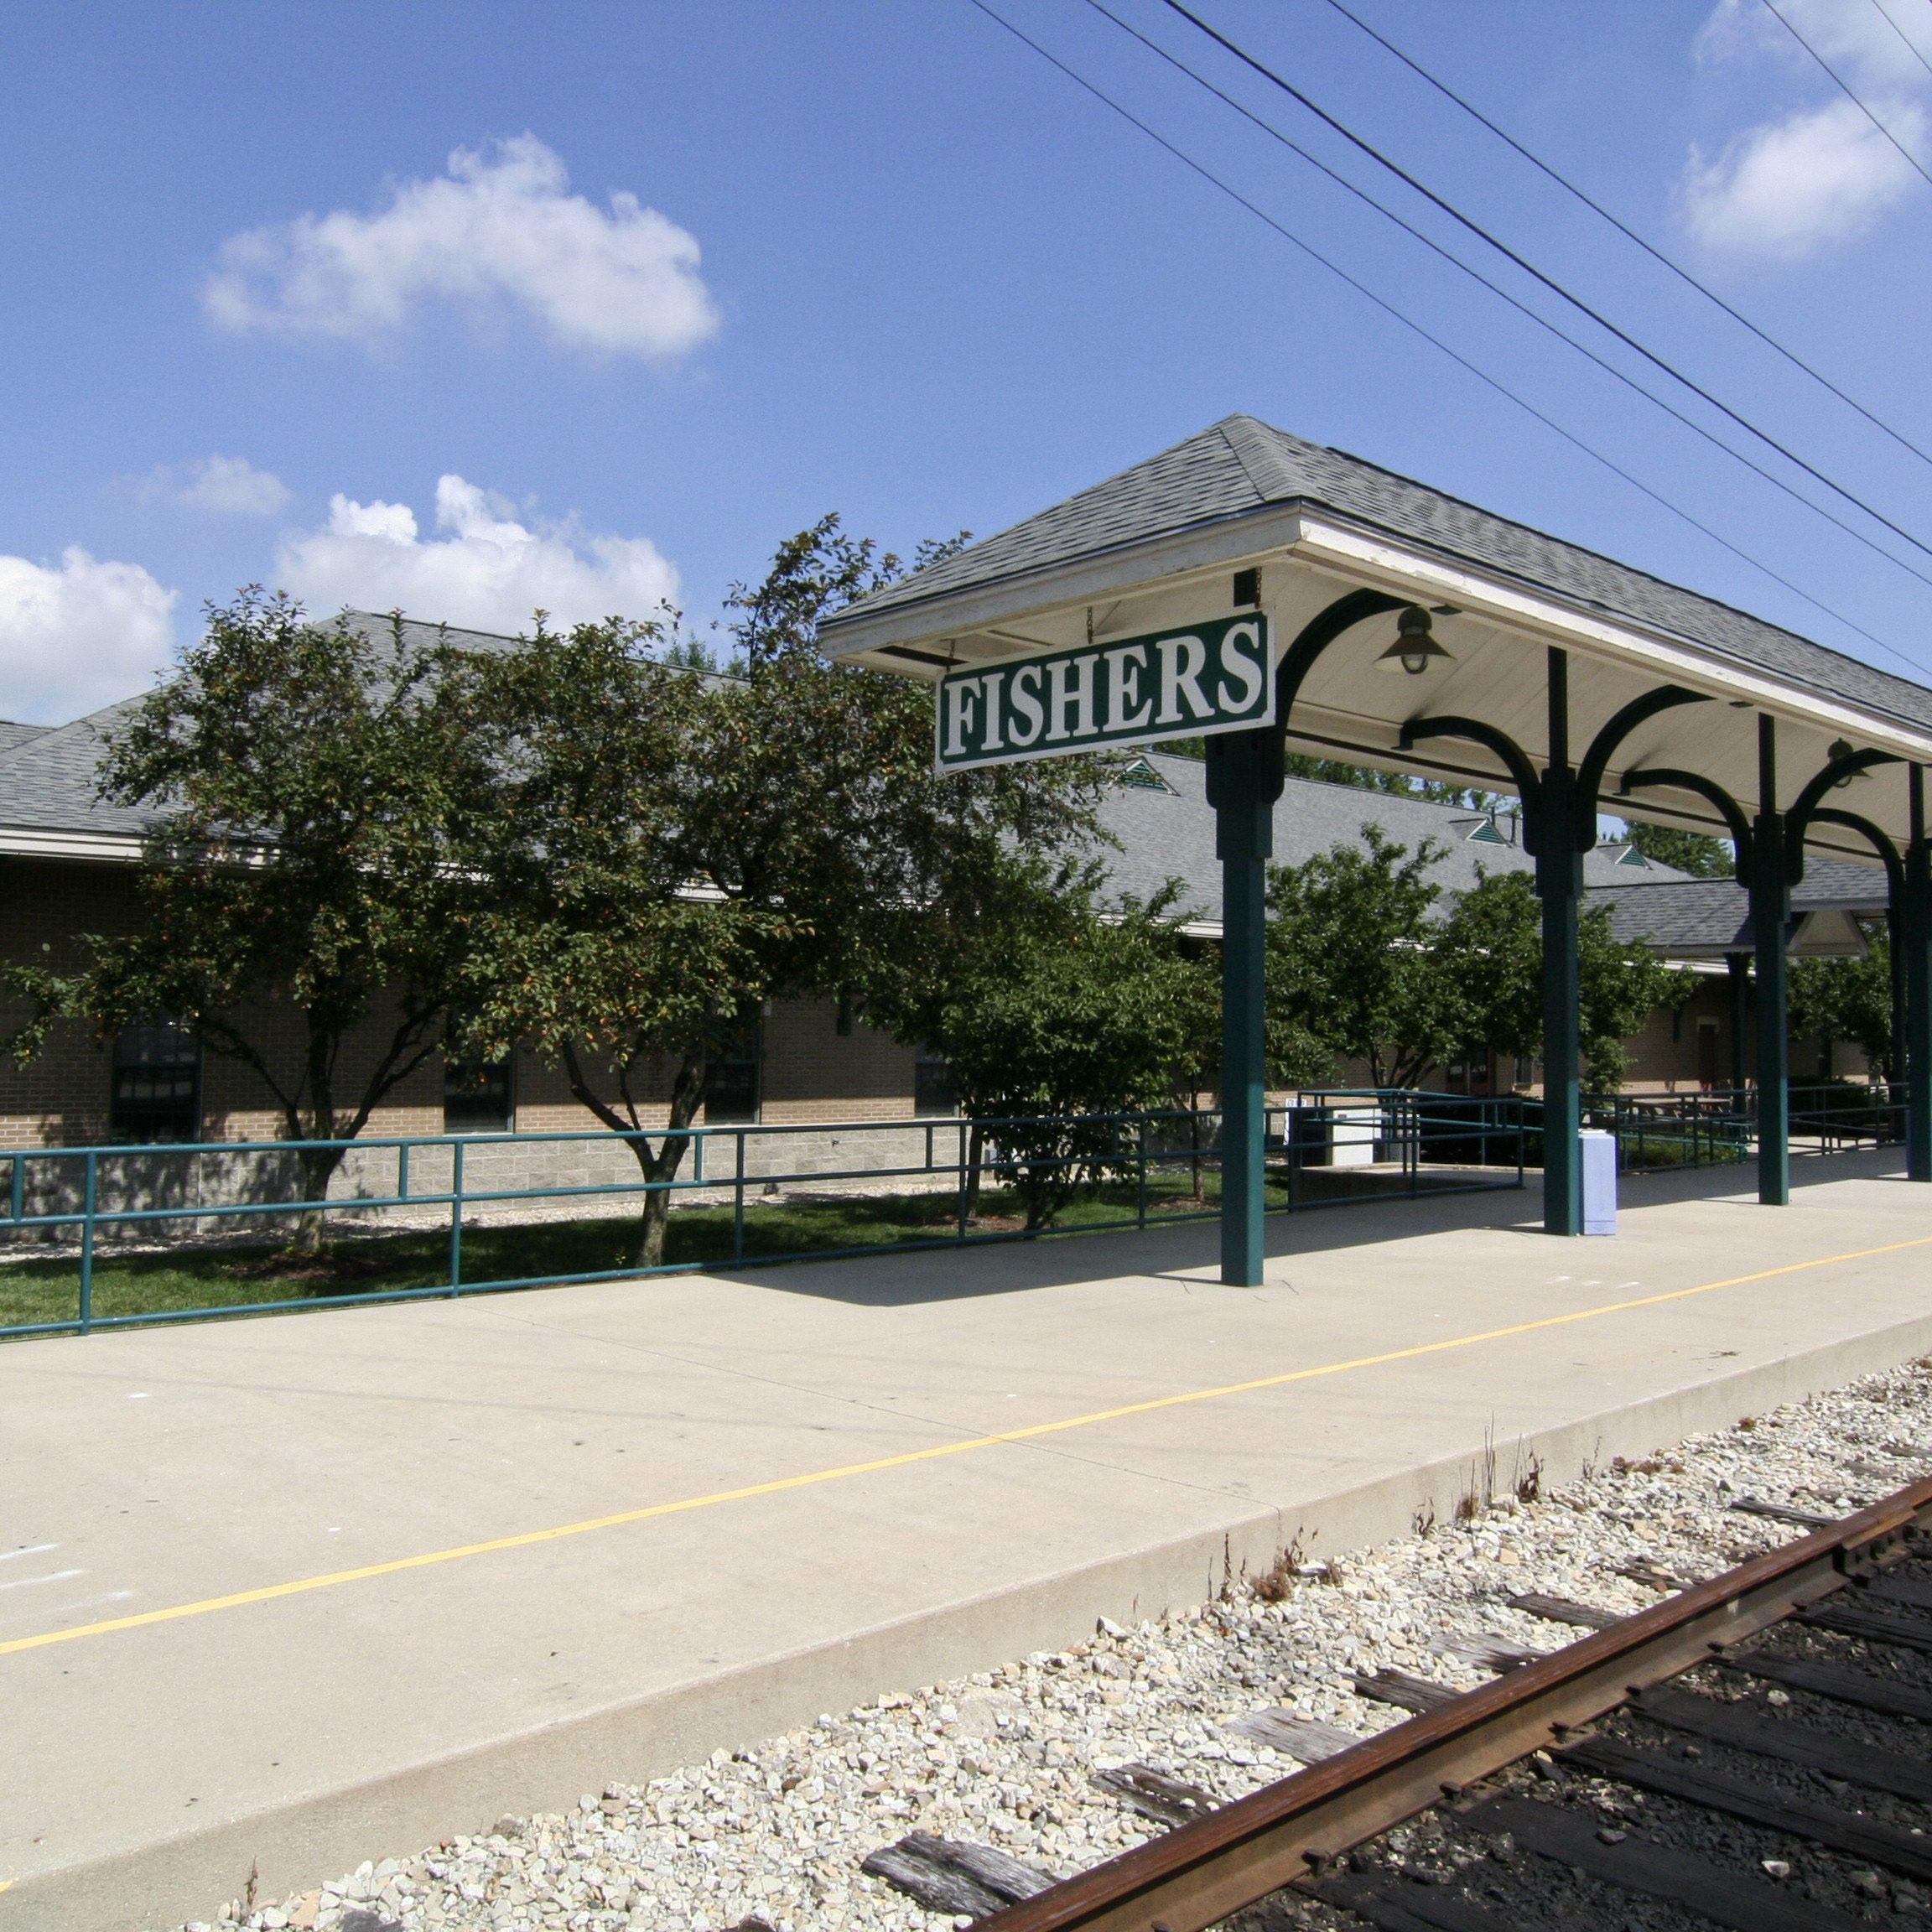 Fishers_Train_Station